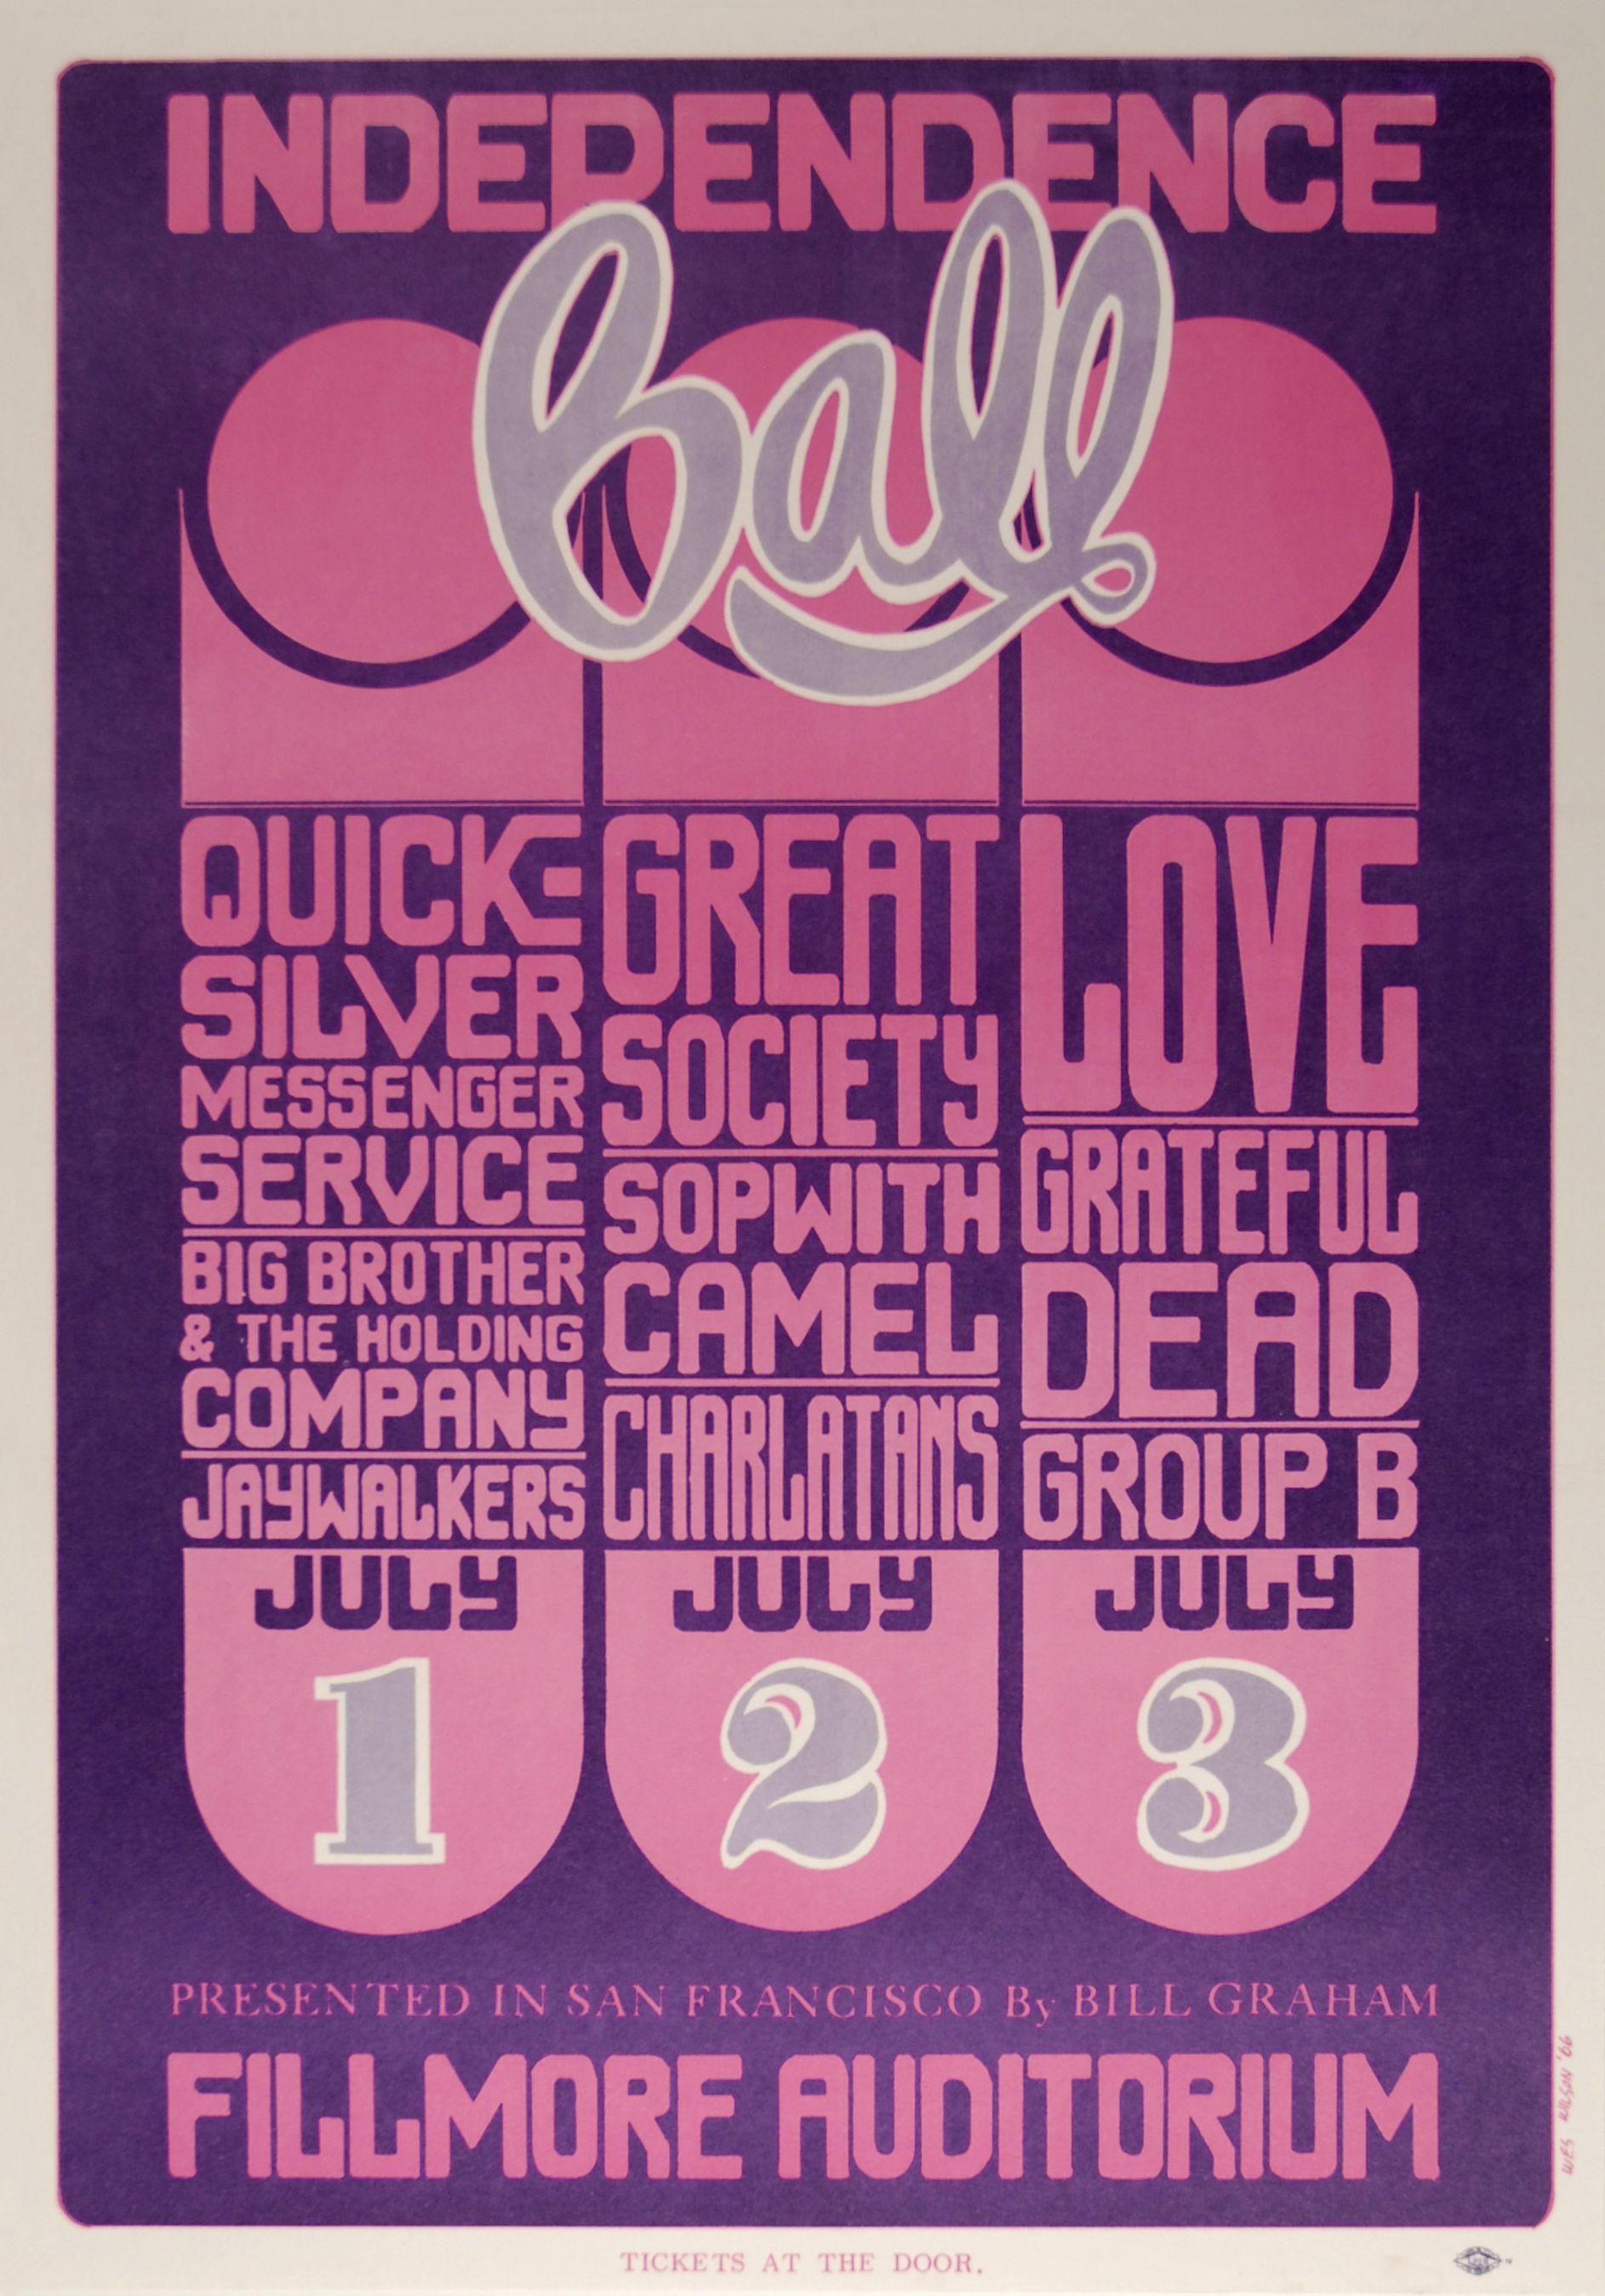 Quicksilver Messenger Service Poster from Fillmore Auditorium (San Francisco, CA), Jul 1966